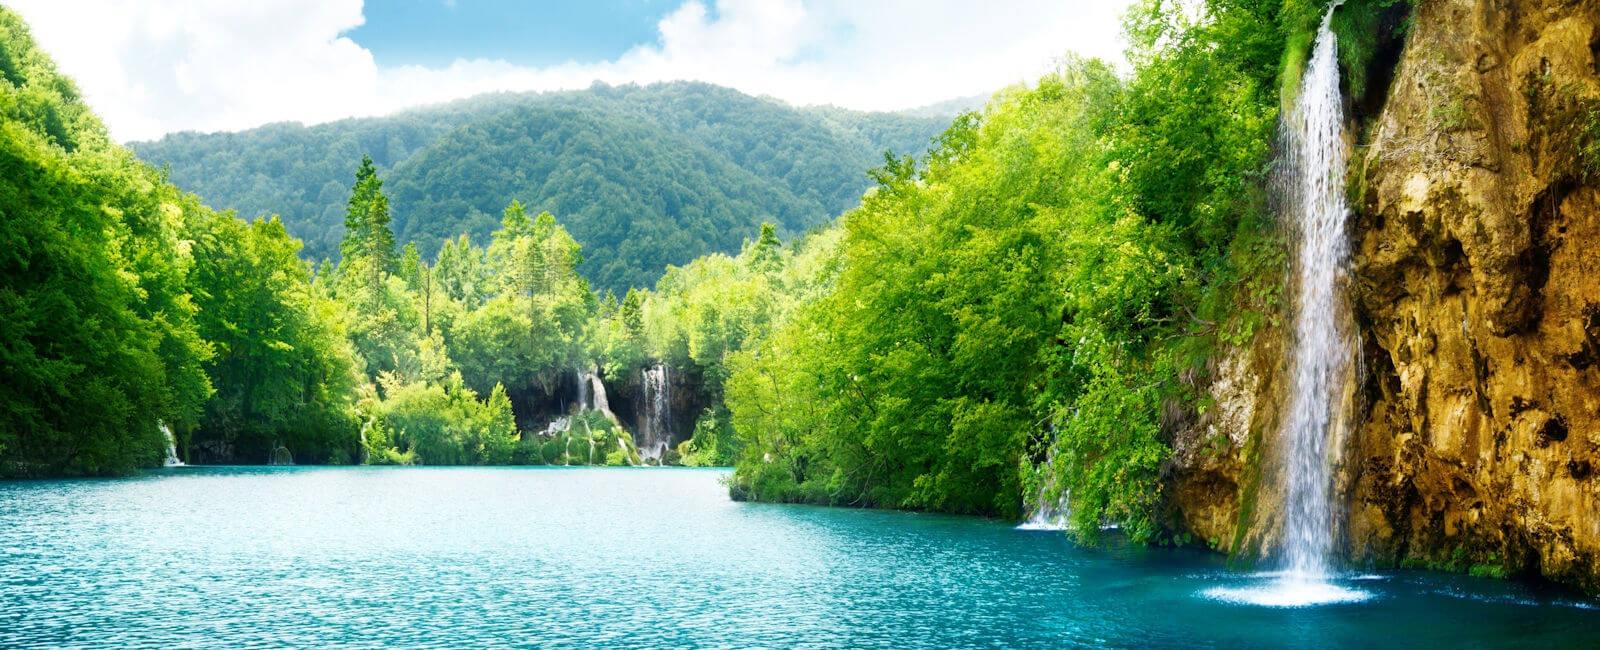 seliste dreznicko, plitvice lakes